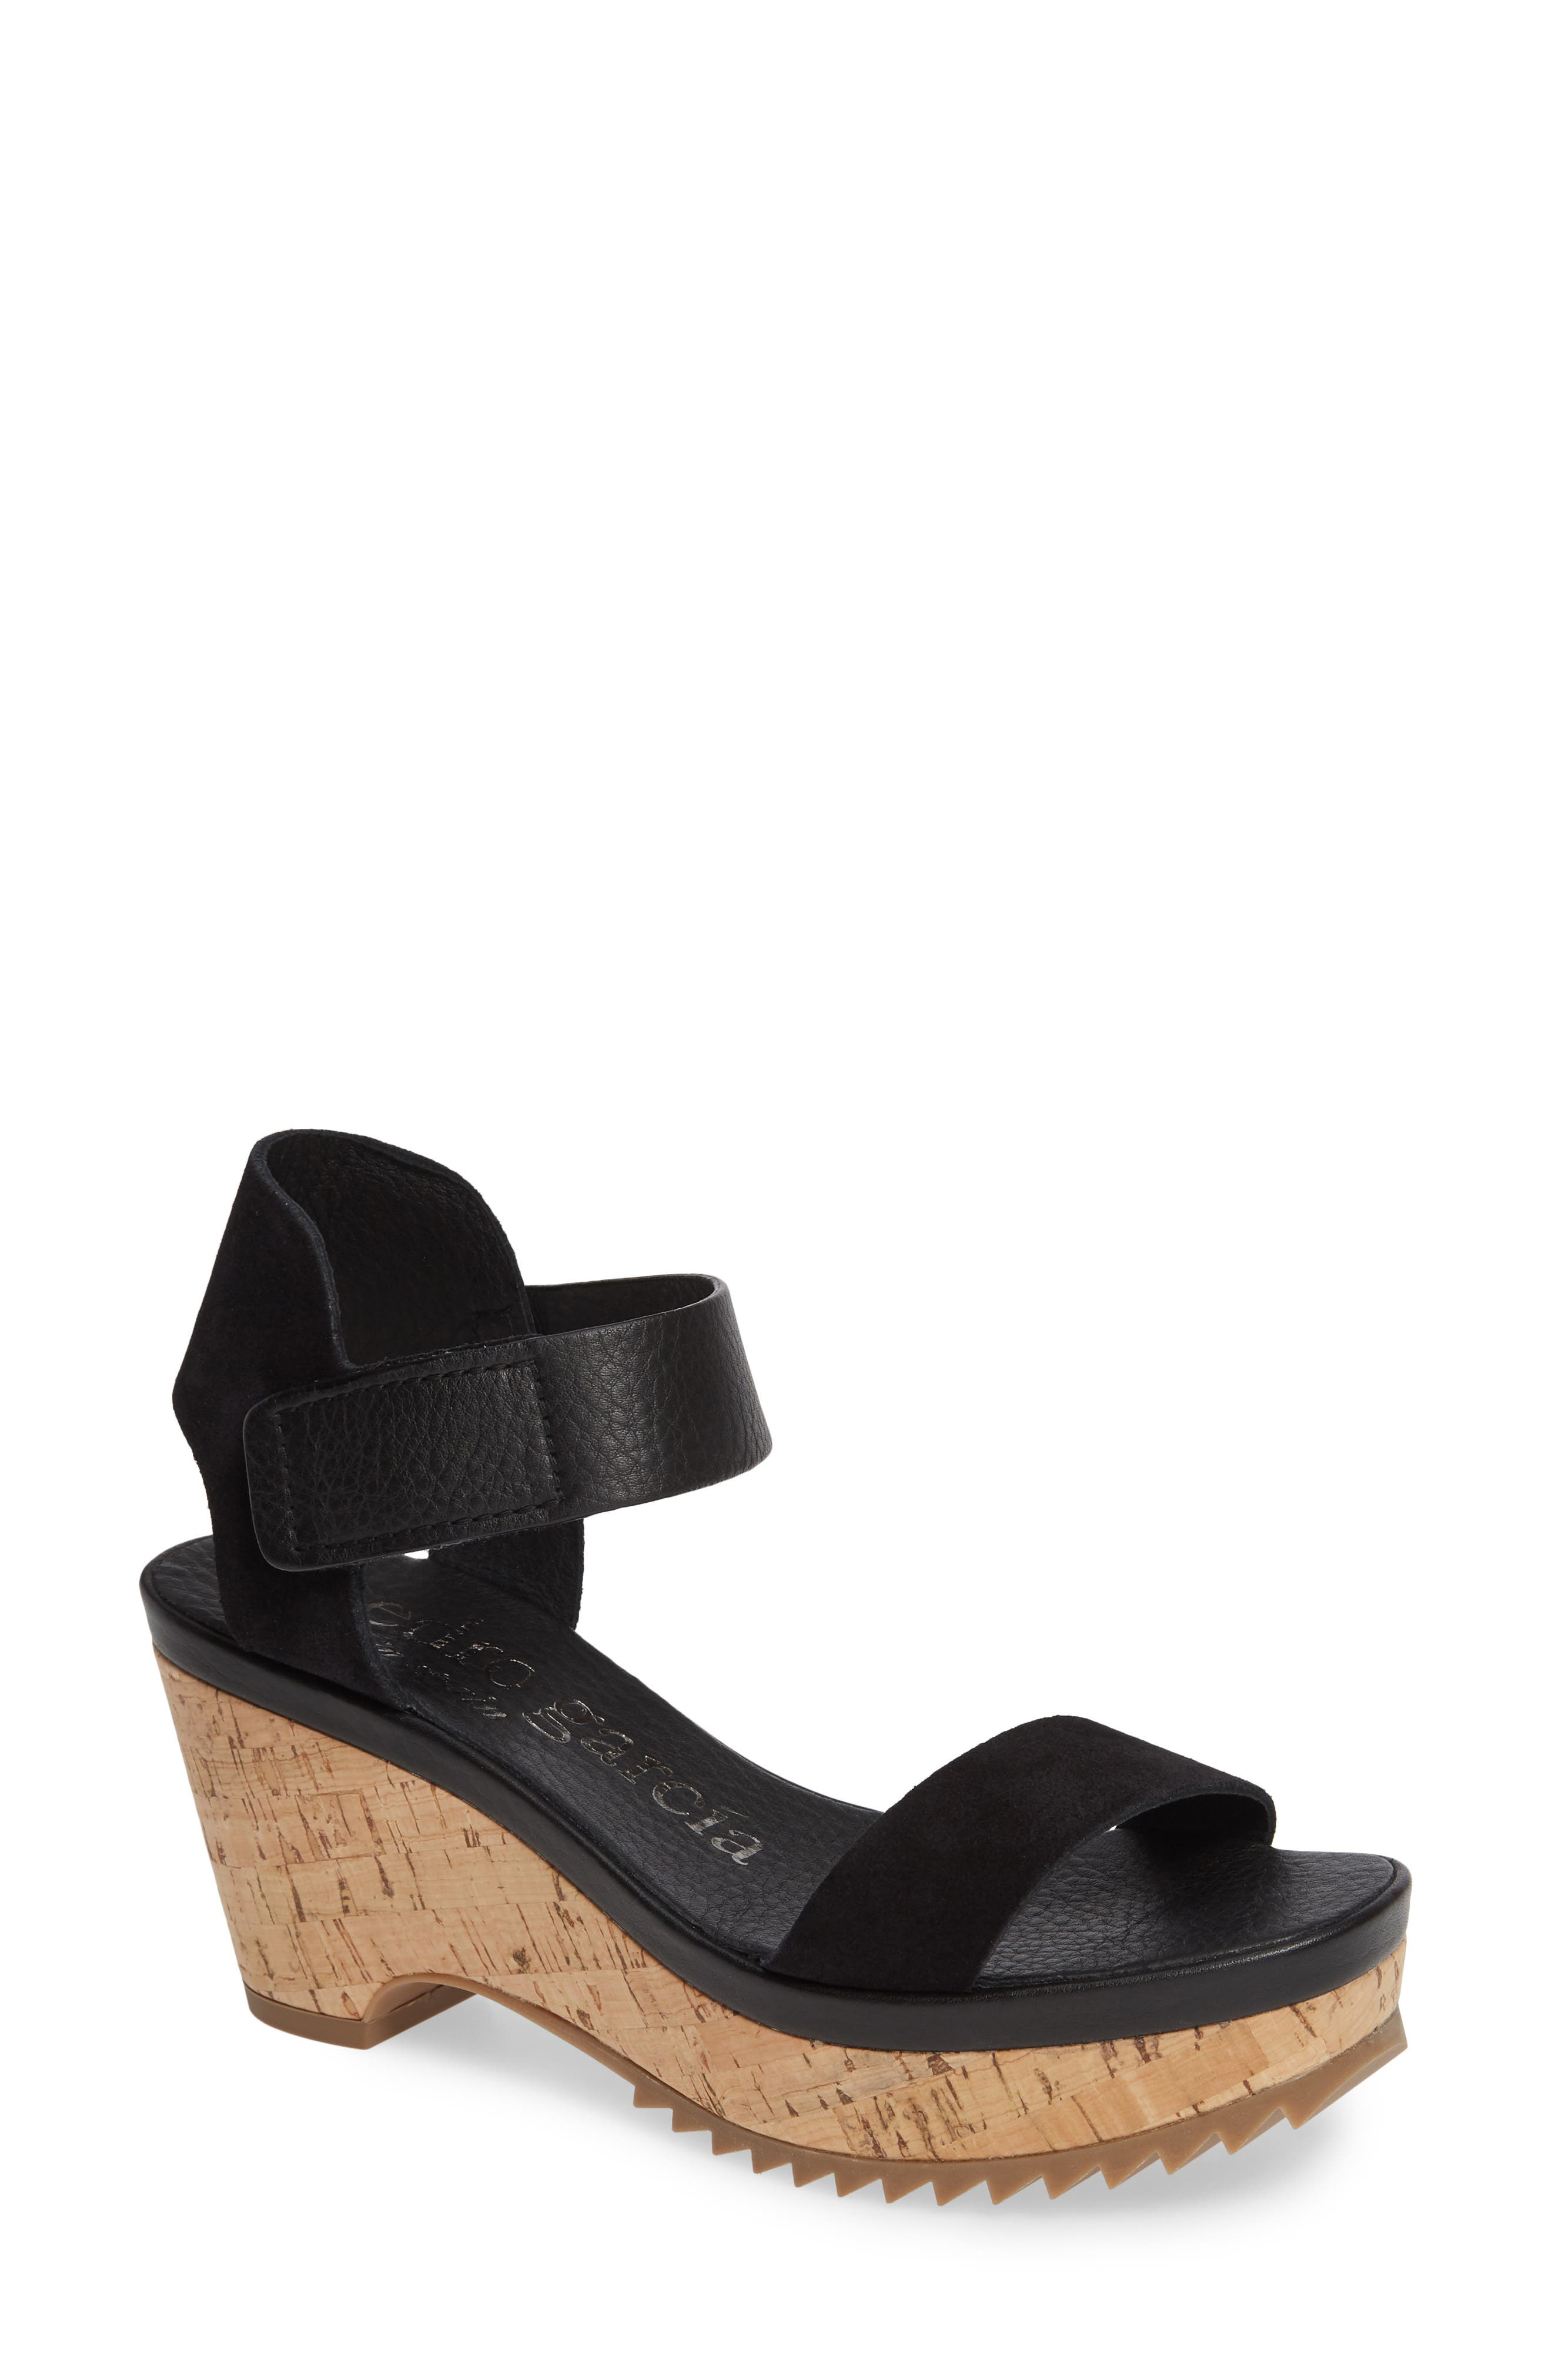 Pedro Garcia Franses Flatform Sandal, Black